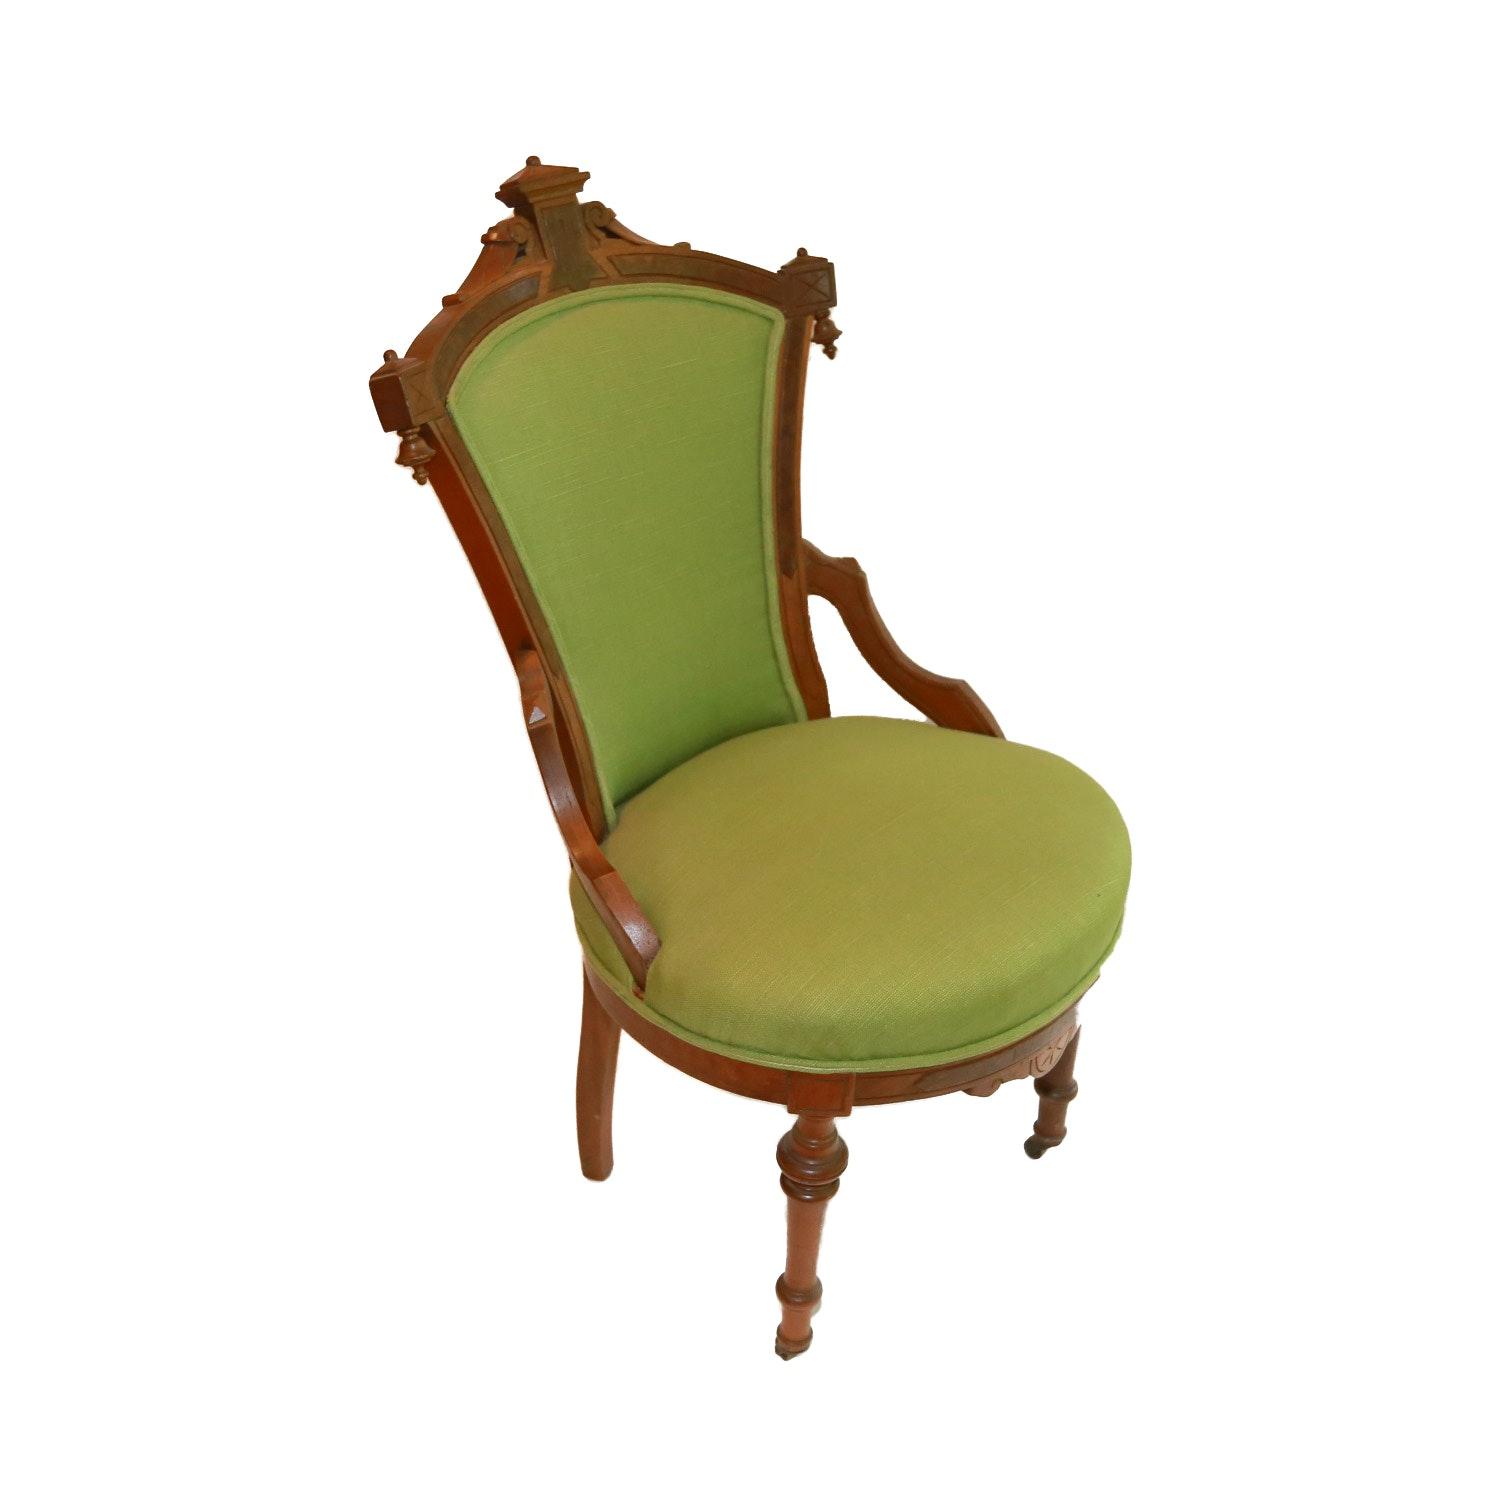 Late 19th Century Victorian Renaissance Revival Parlor Chair